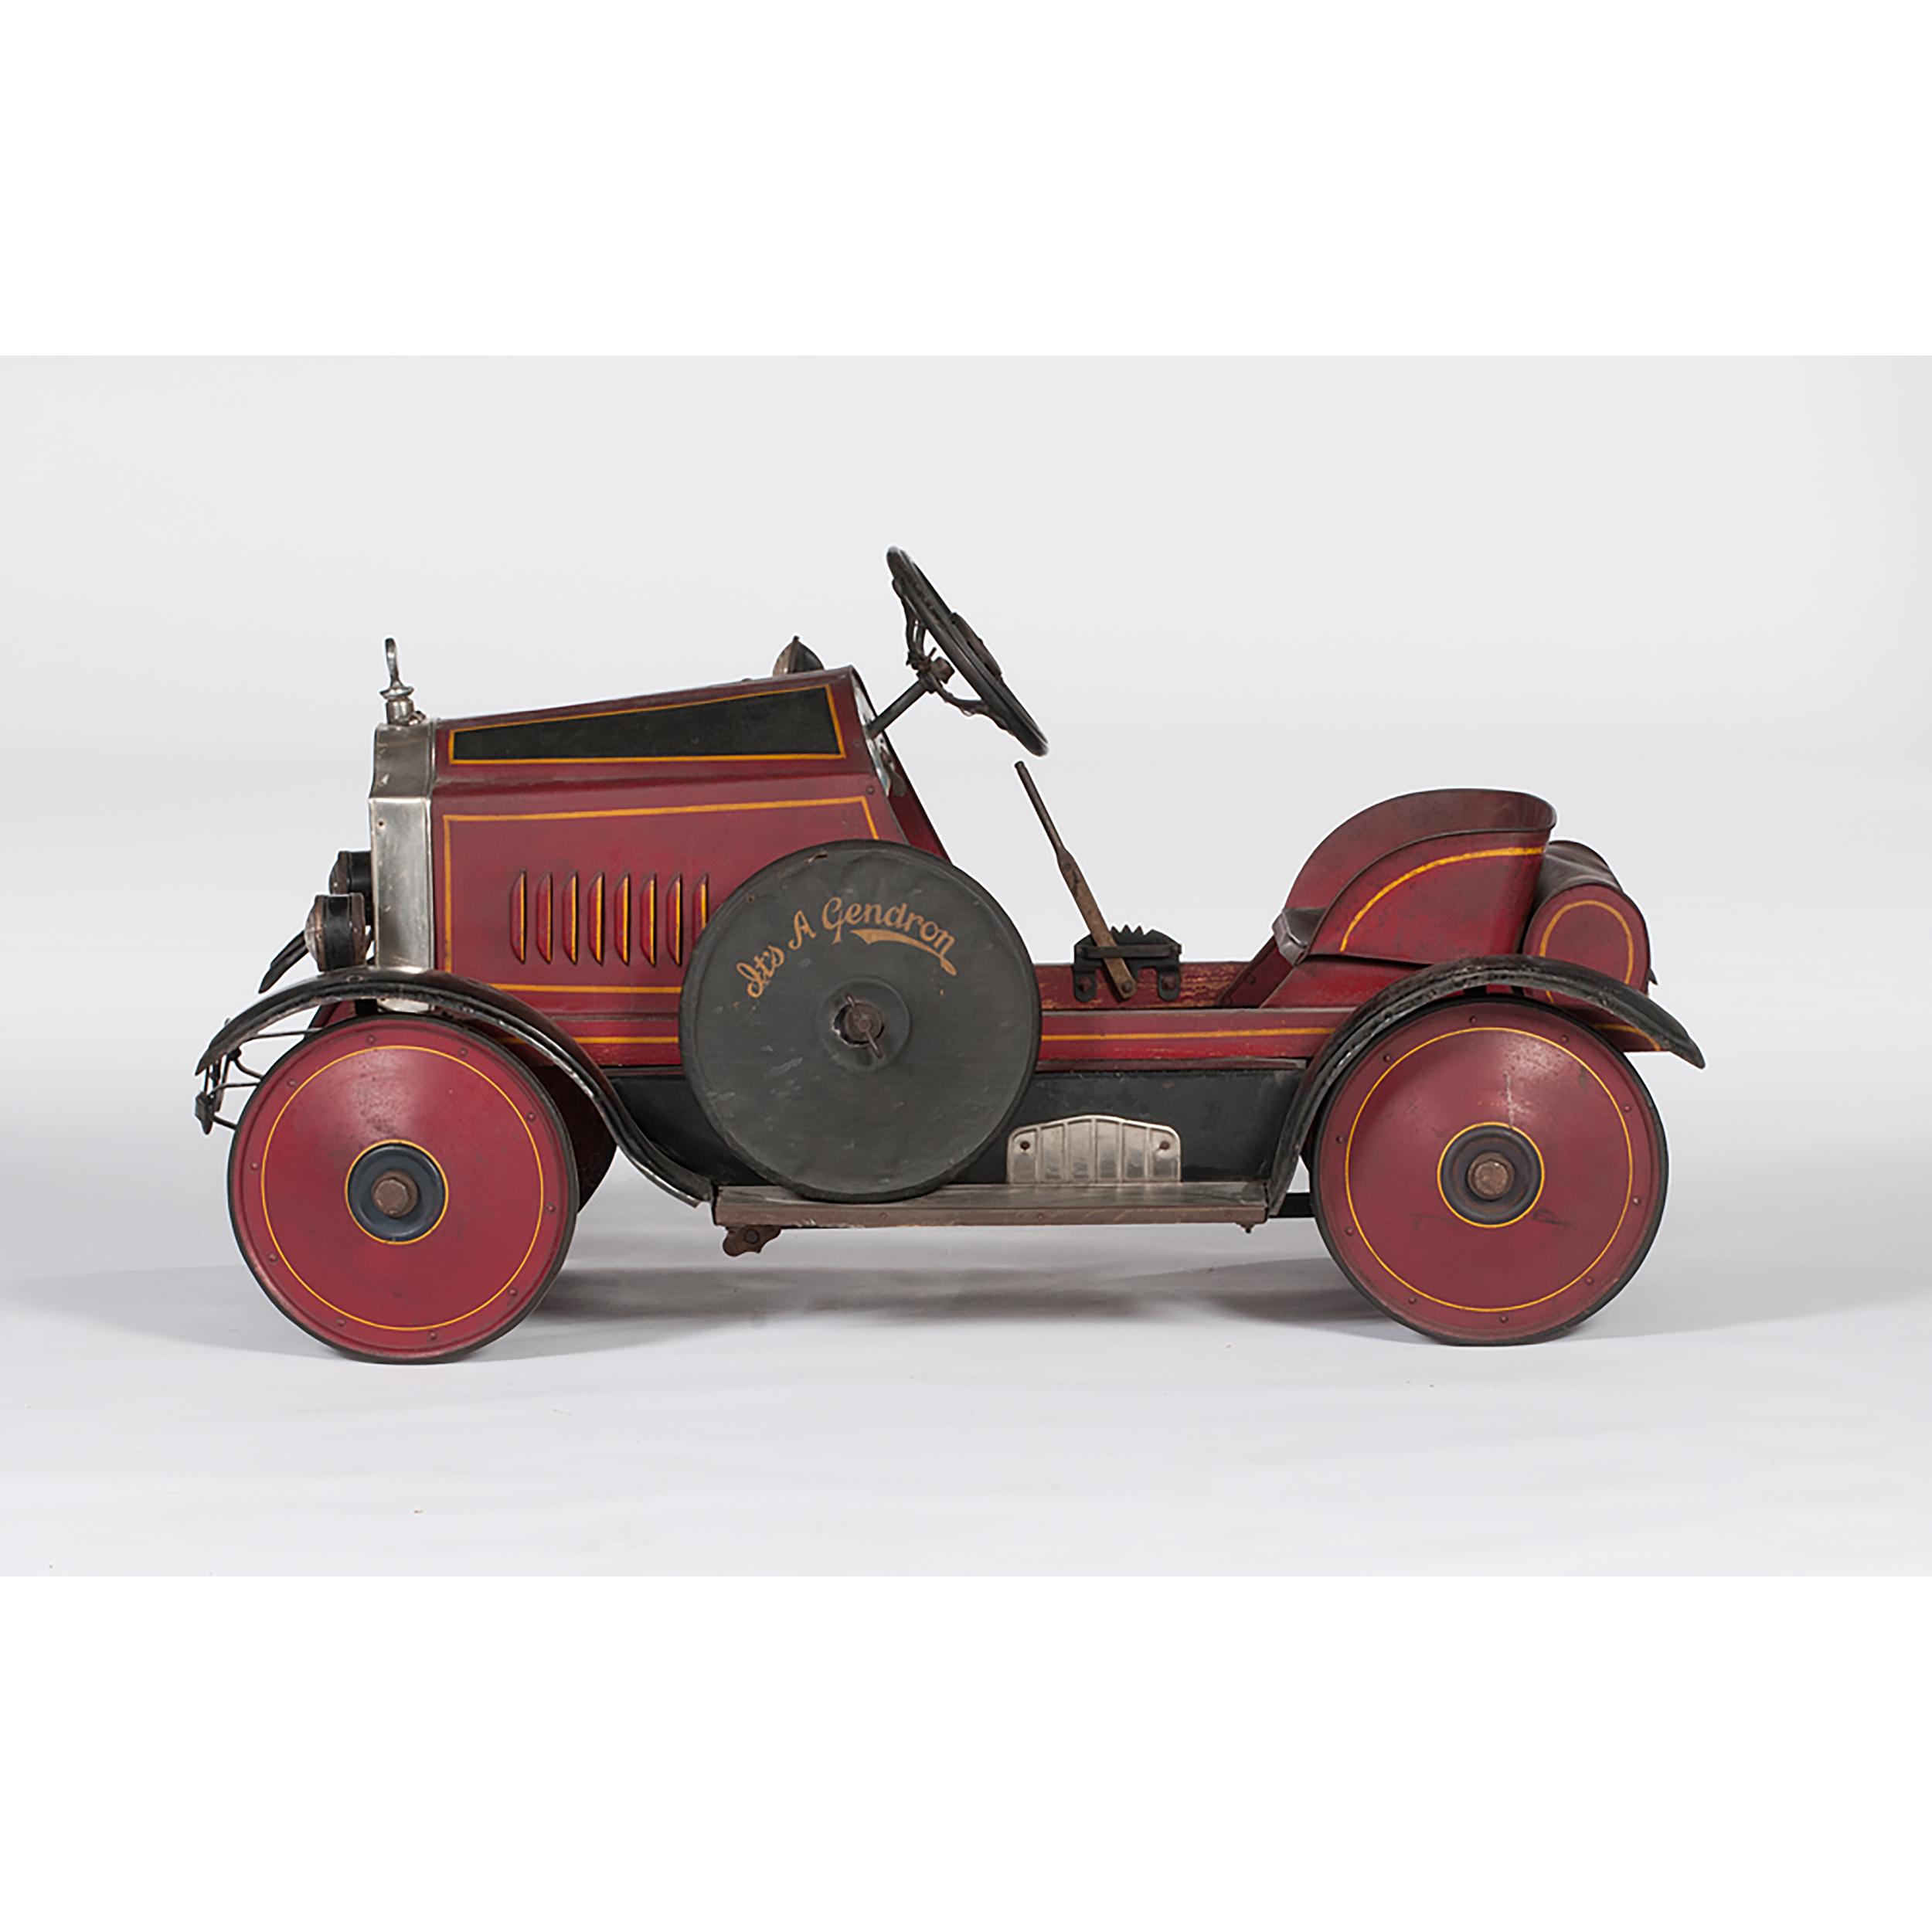 Gendron Pedal Car Company